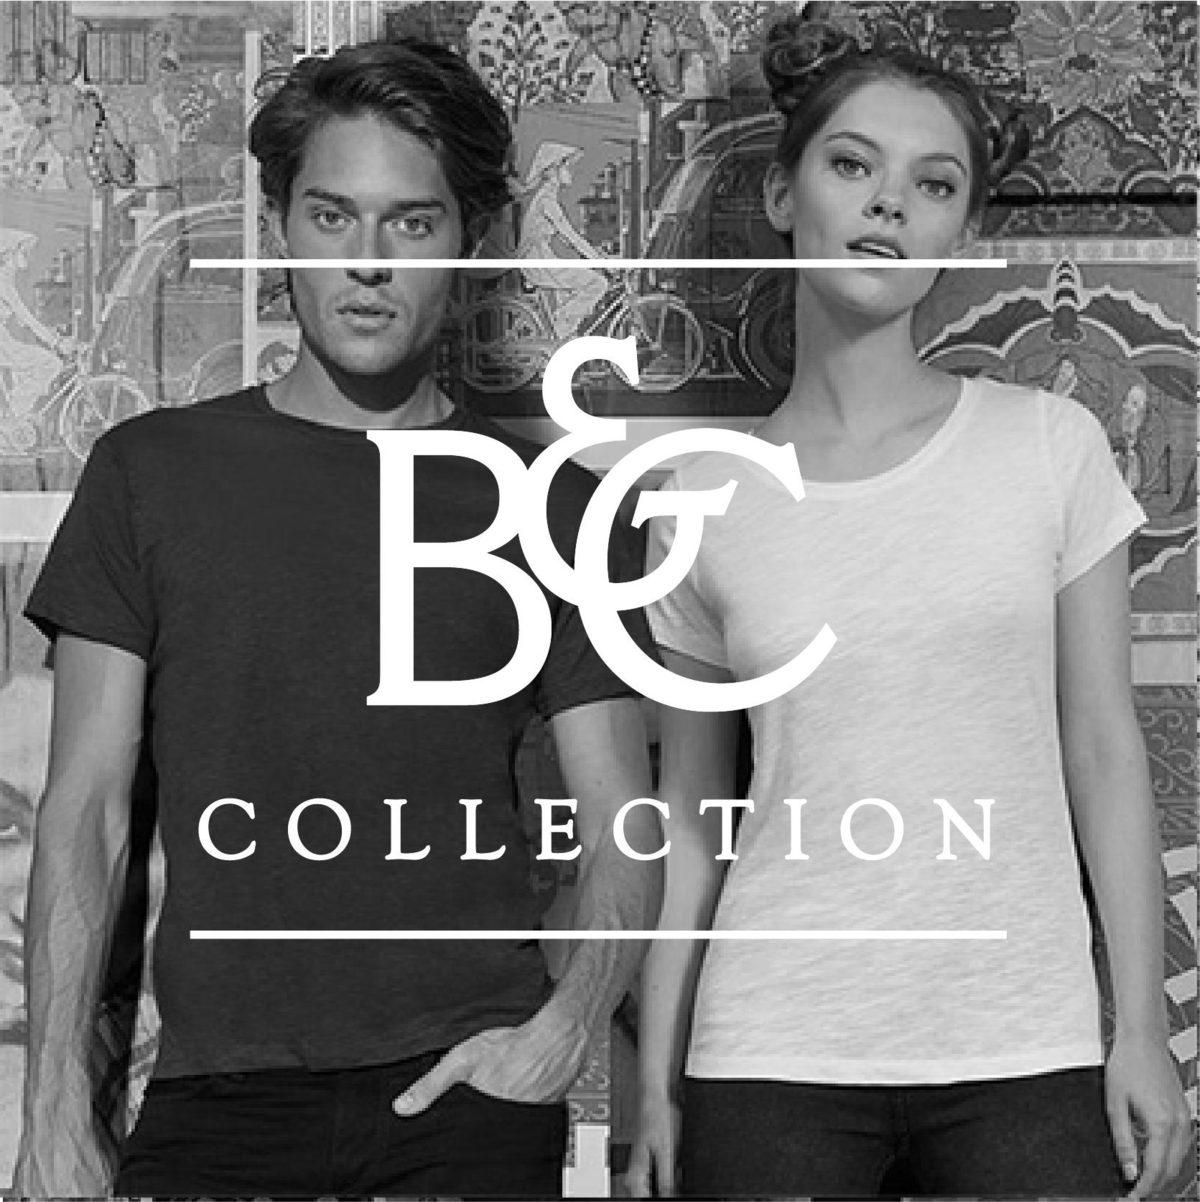 Image_bc-collection--0-0--b0b6cf92-b97f-4838-8c8b-d91fc2d58276